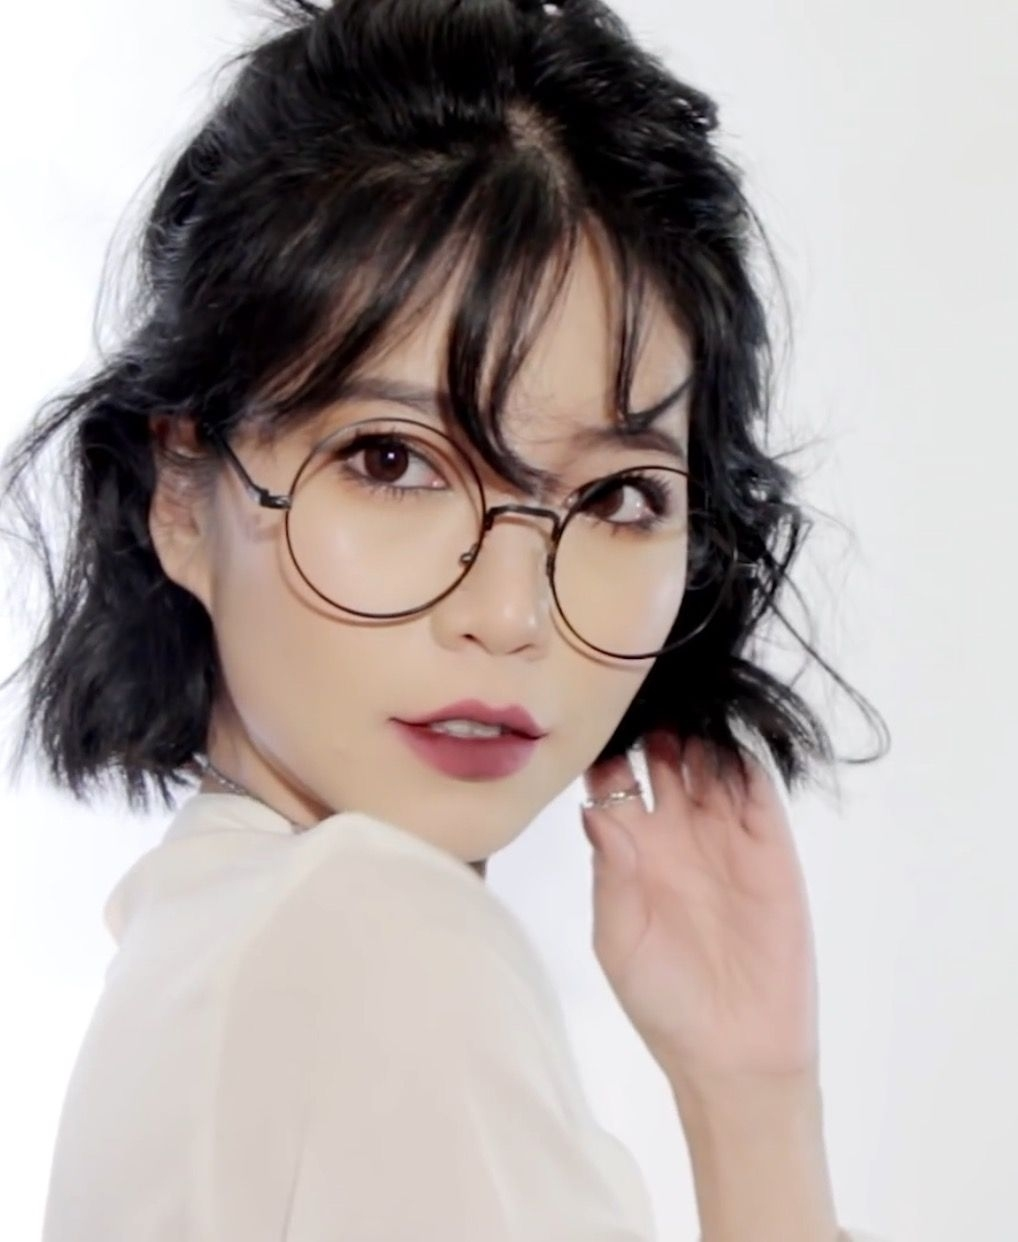 Sichenmakeupholic | Hair In 2019 | Korean Short Hair, Medium Hair in Asian Hairstyle With Glasses